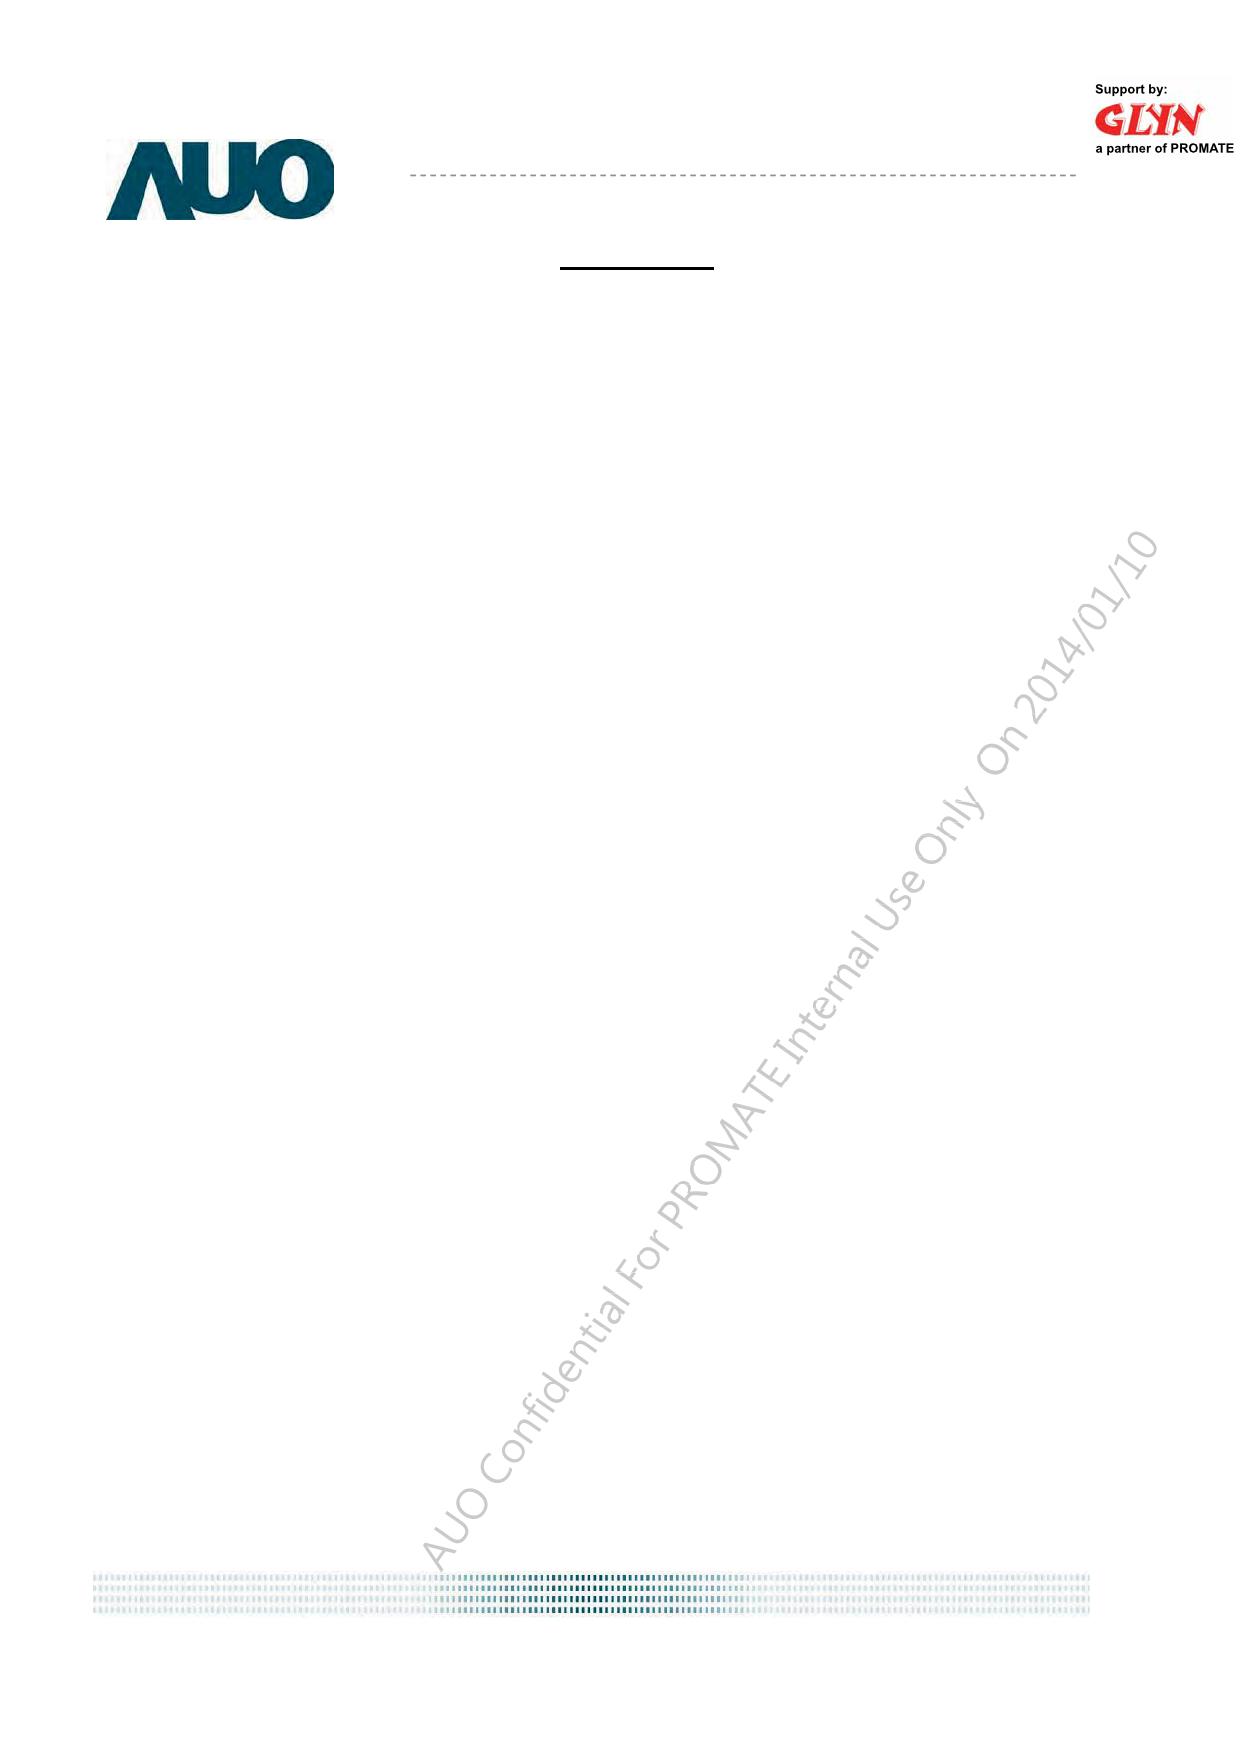 G070VVN01.100 Даташит, Описание, Даташиты